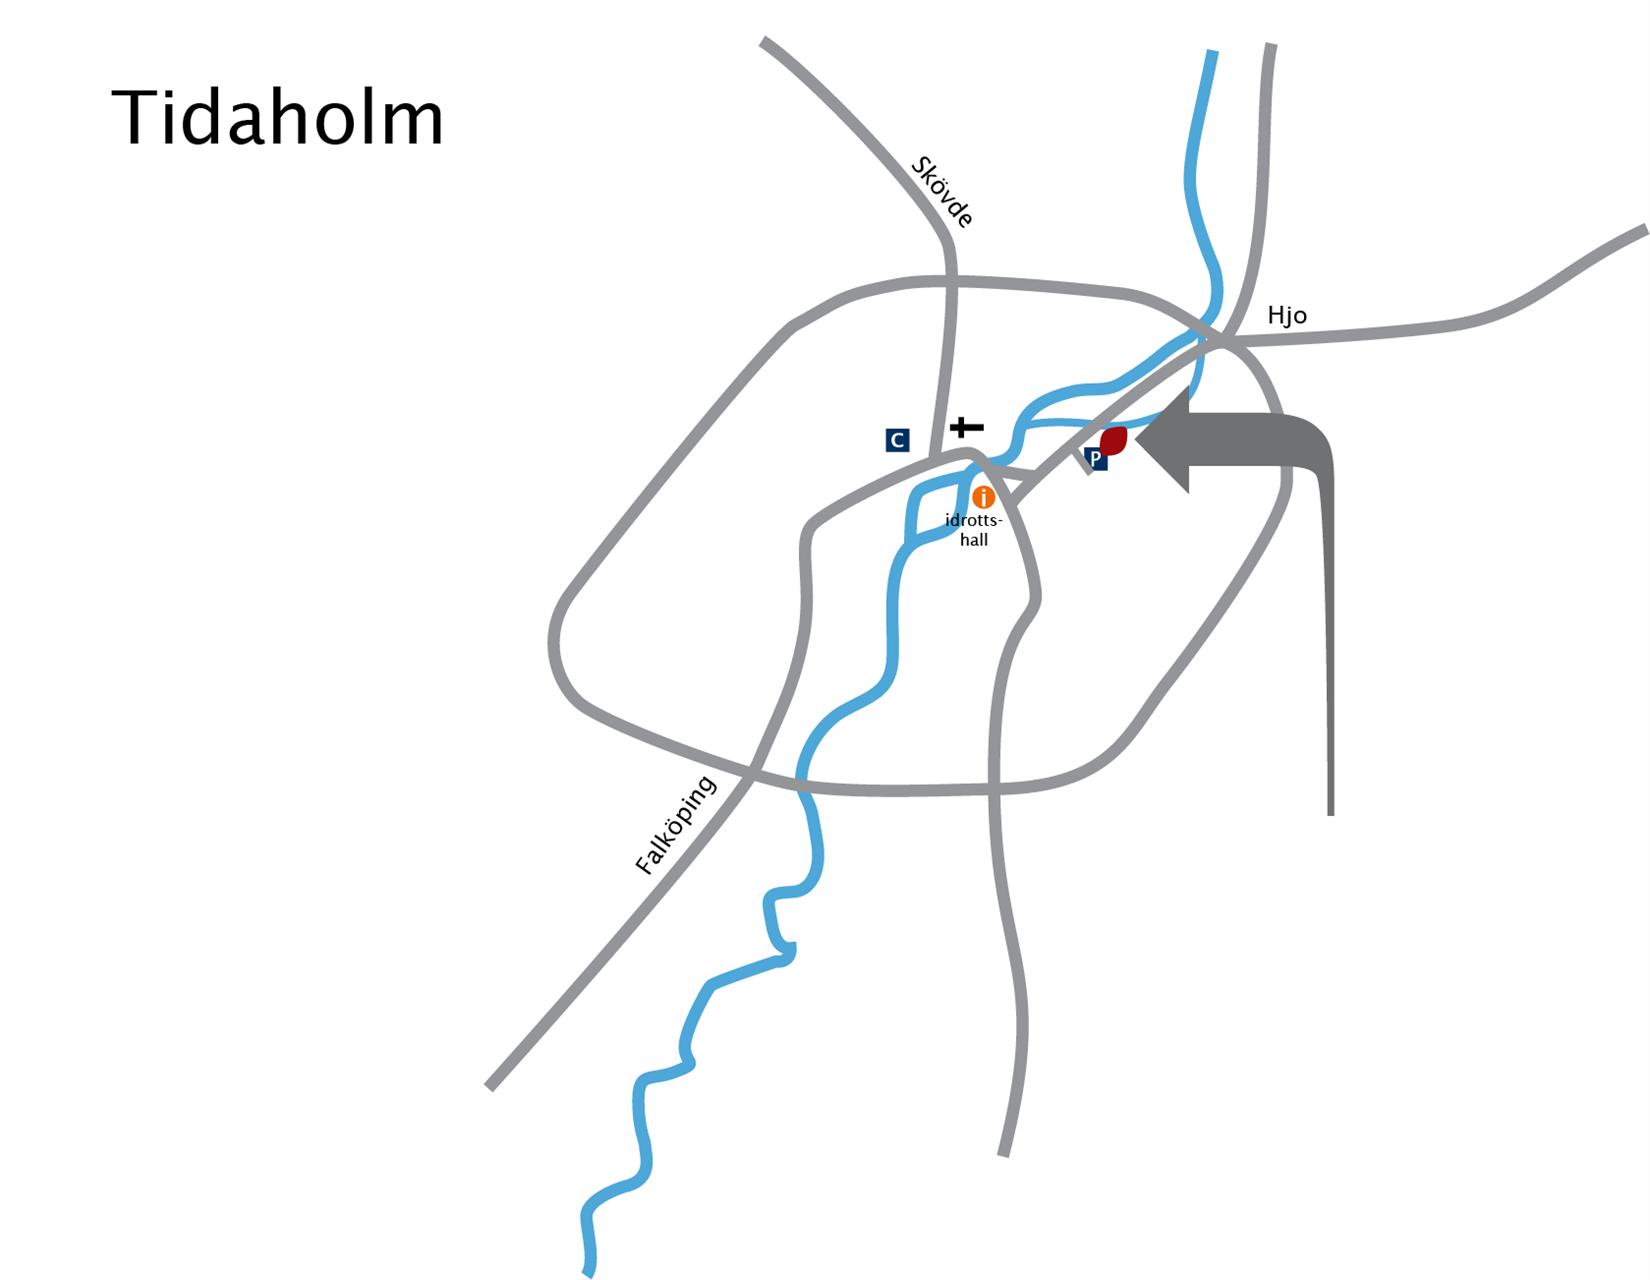 Smedjegatan 12, Tidaholm